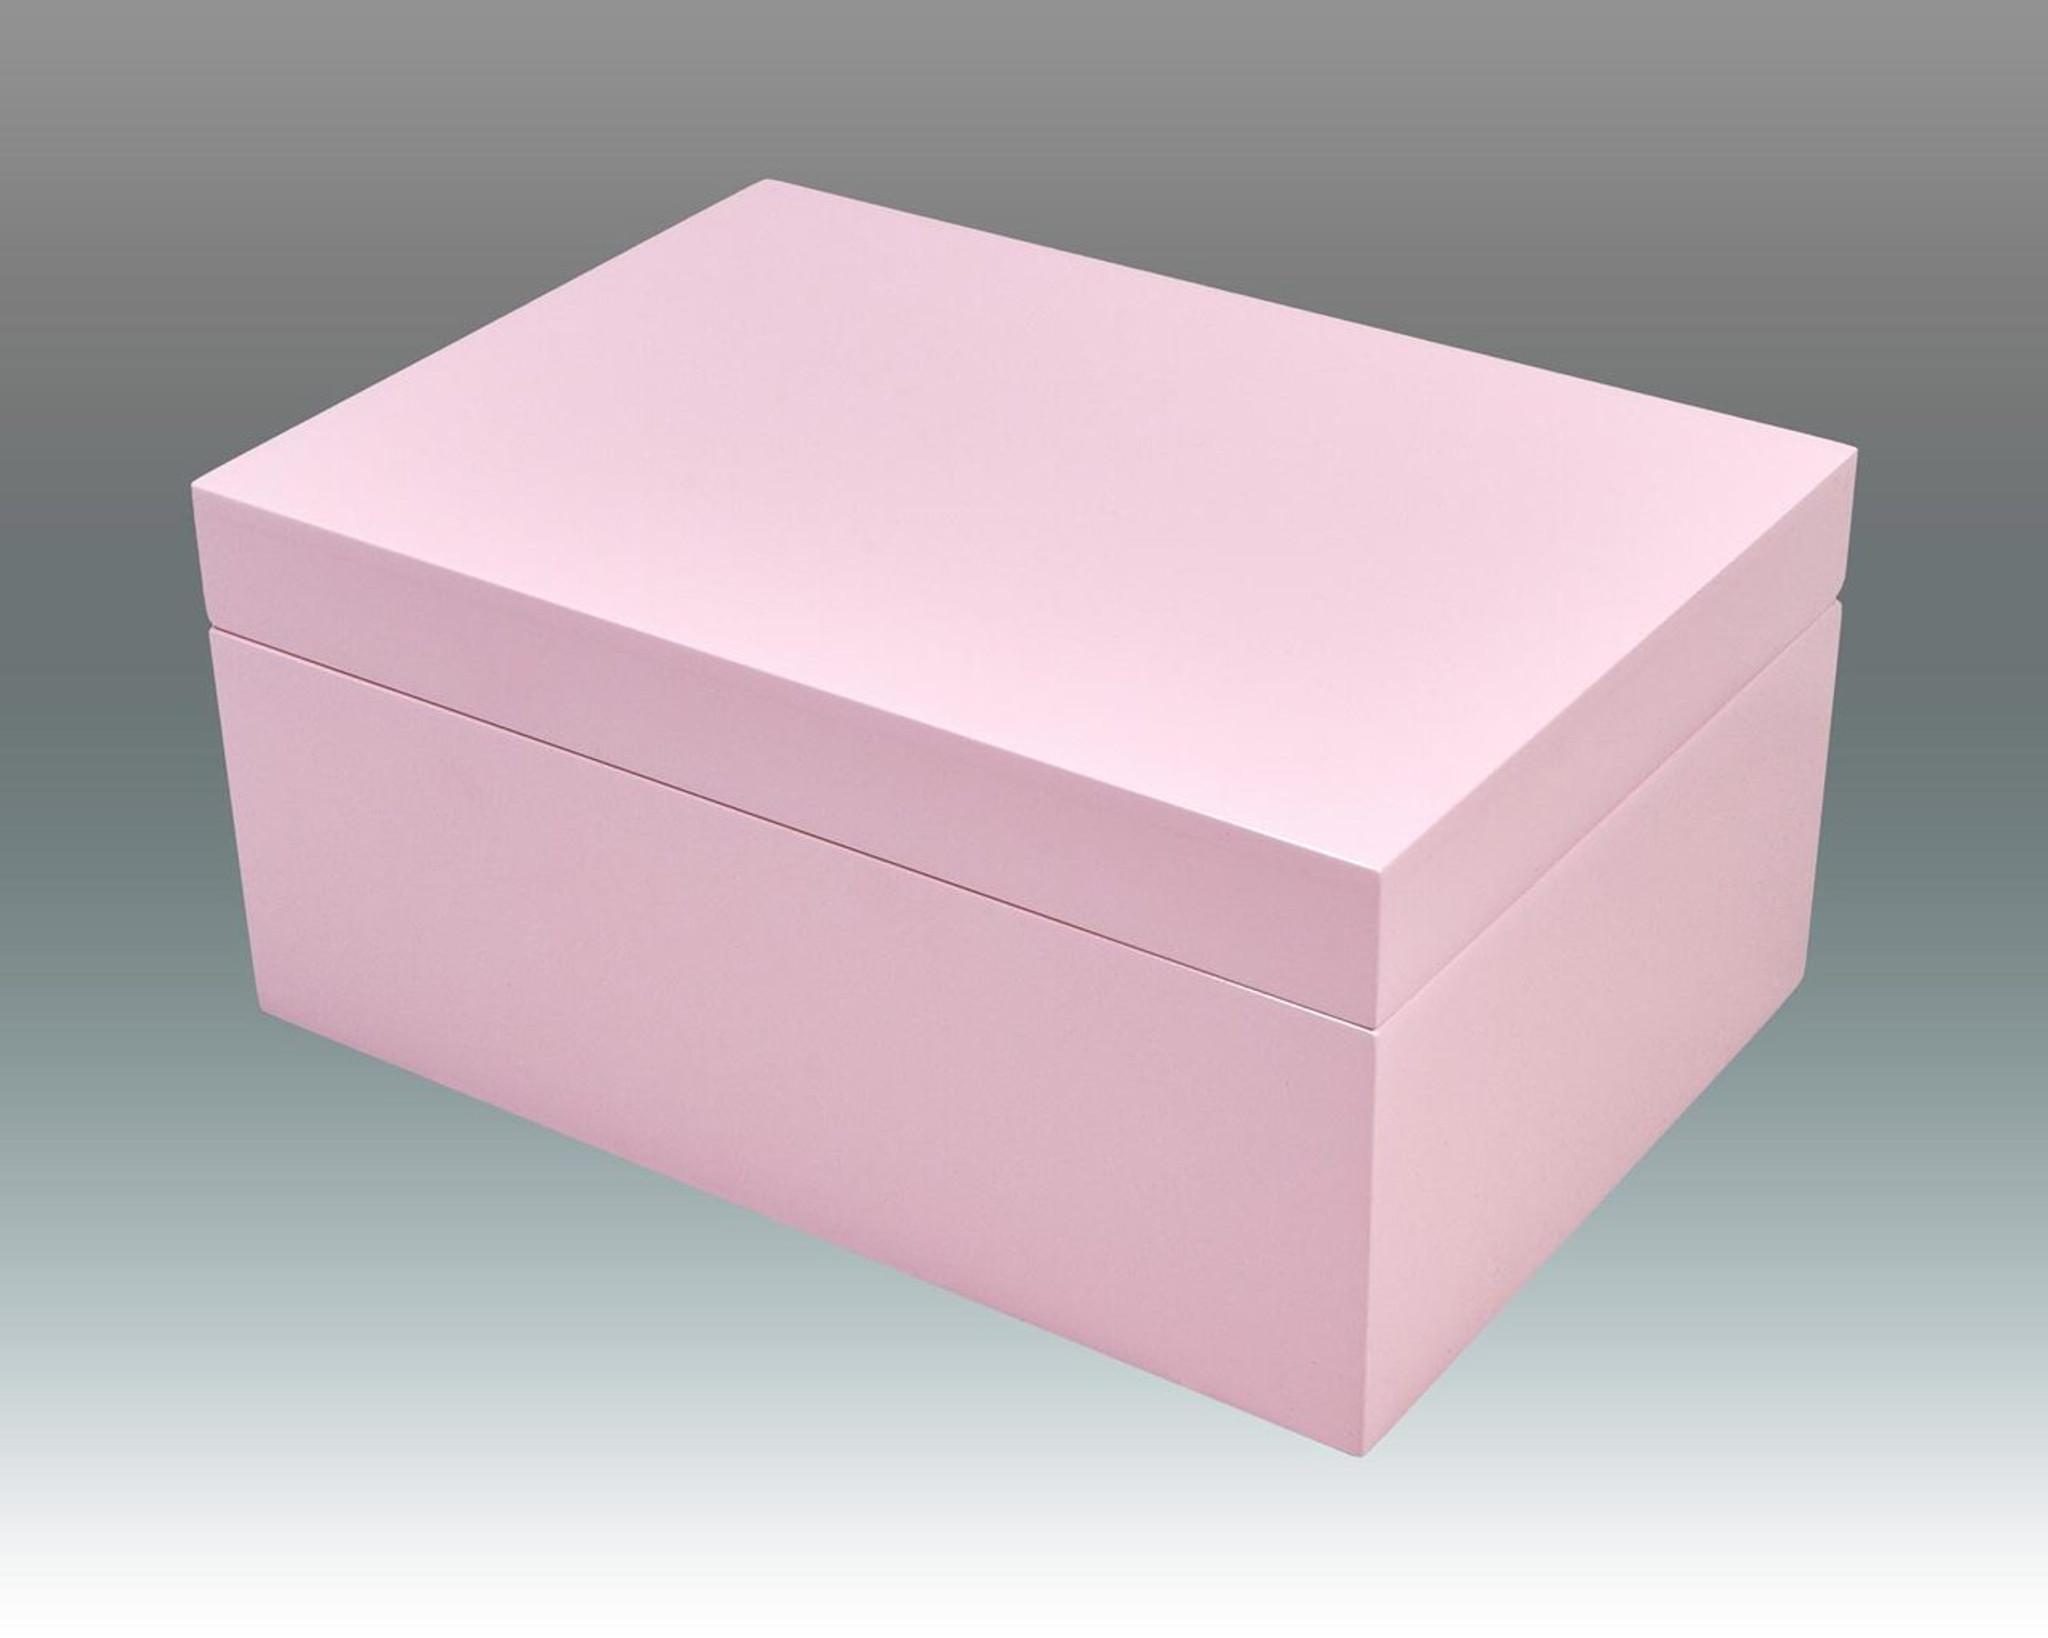 Tizo Jewelry Box with Tray Pink HomeBello